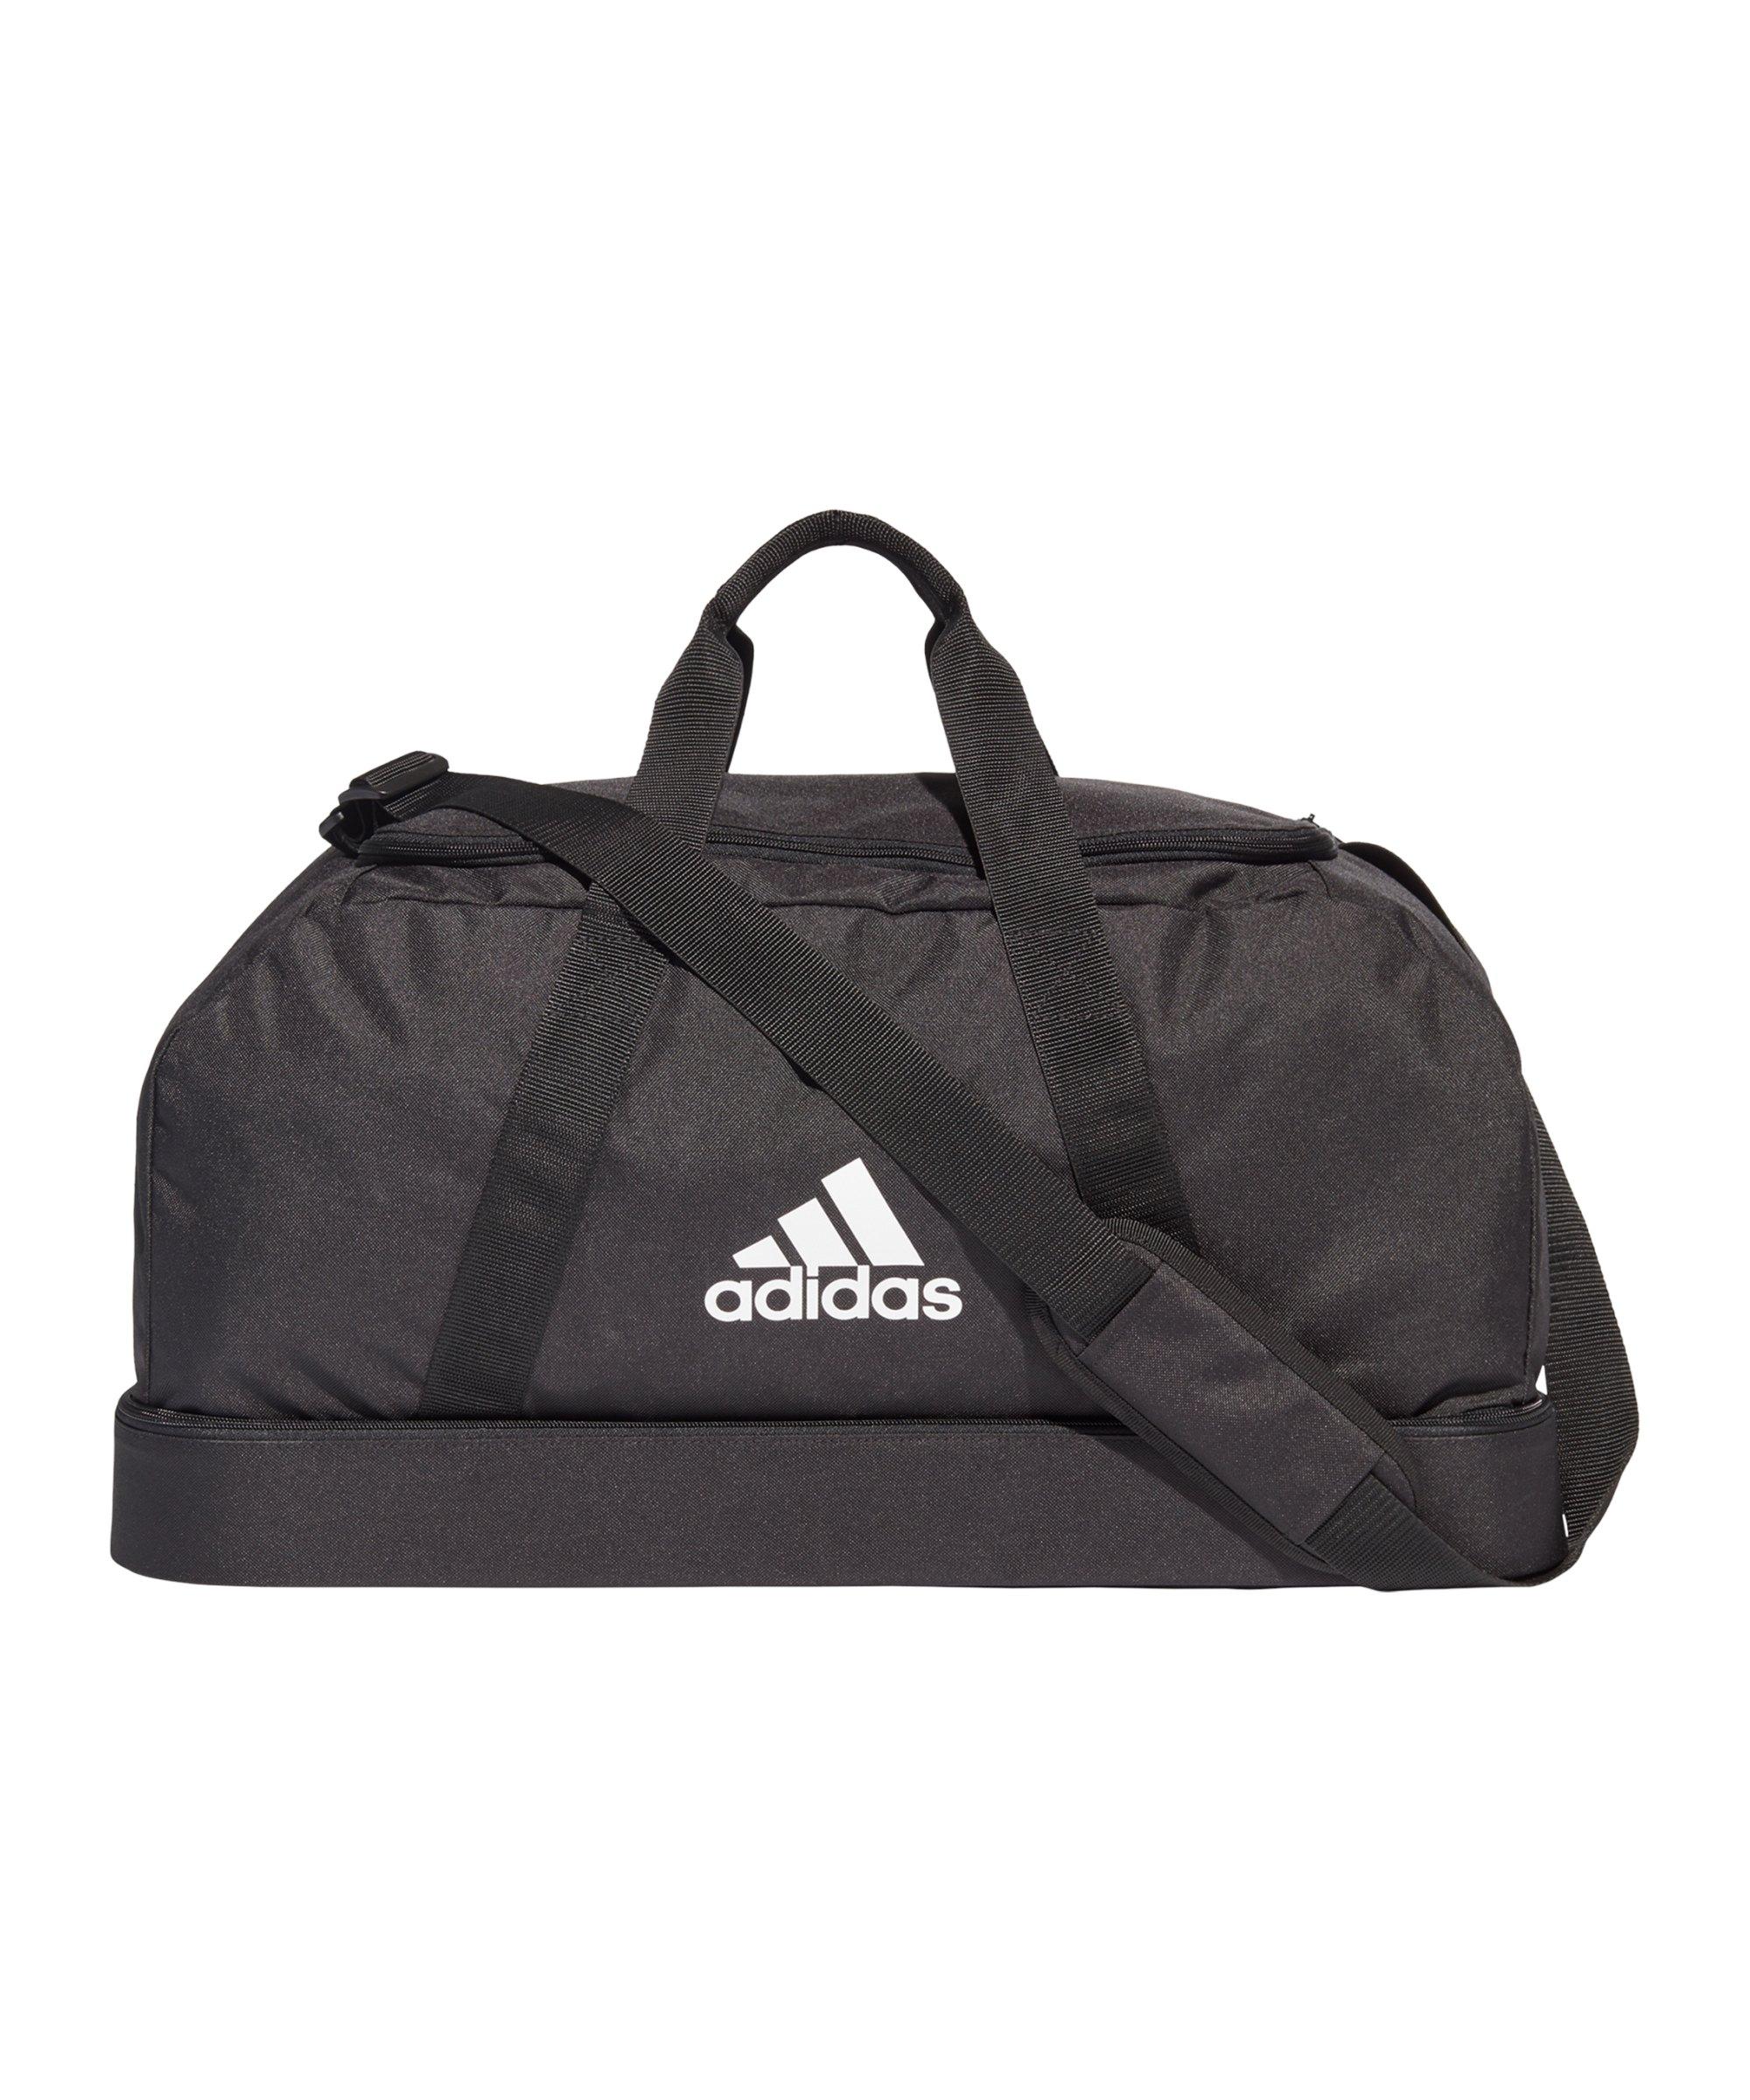 adidas Tiro Duffel Bag BC Gr. M Schwarz Weiss - schwarz